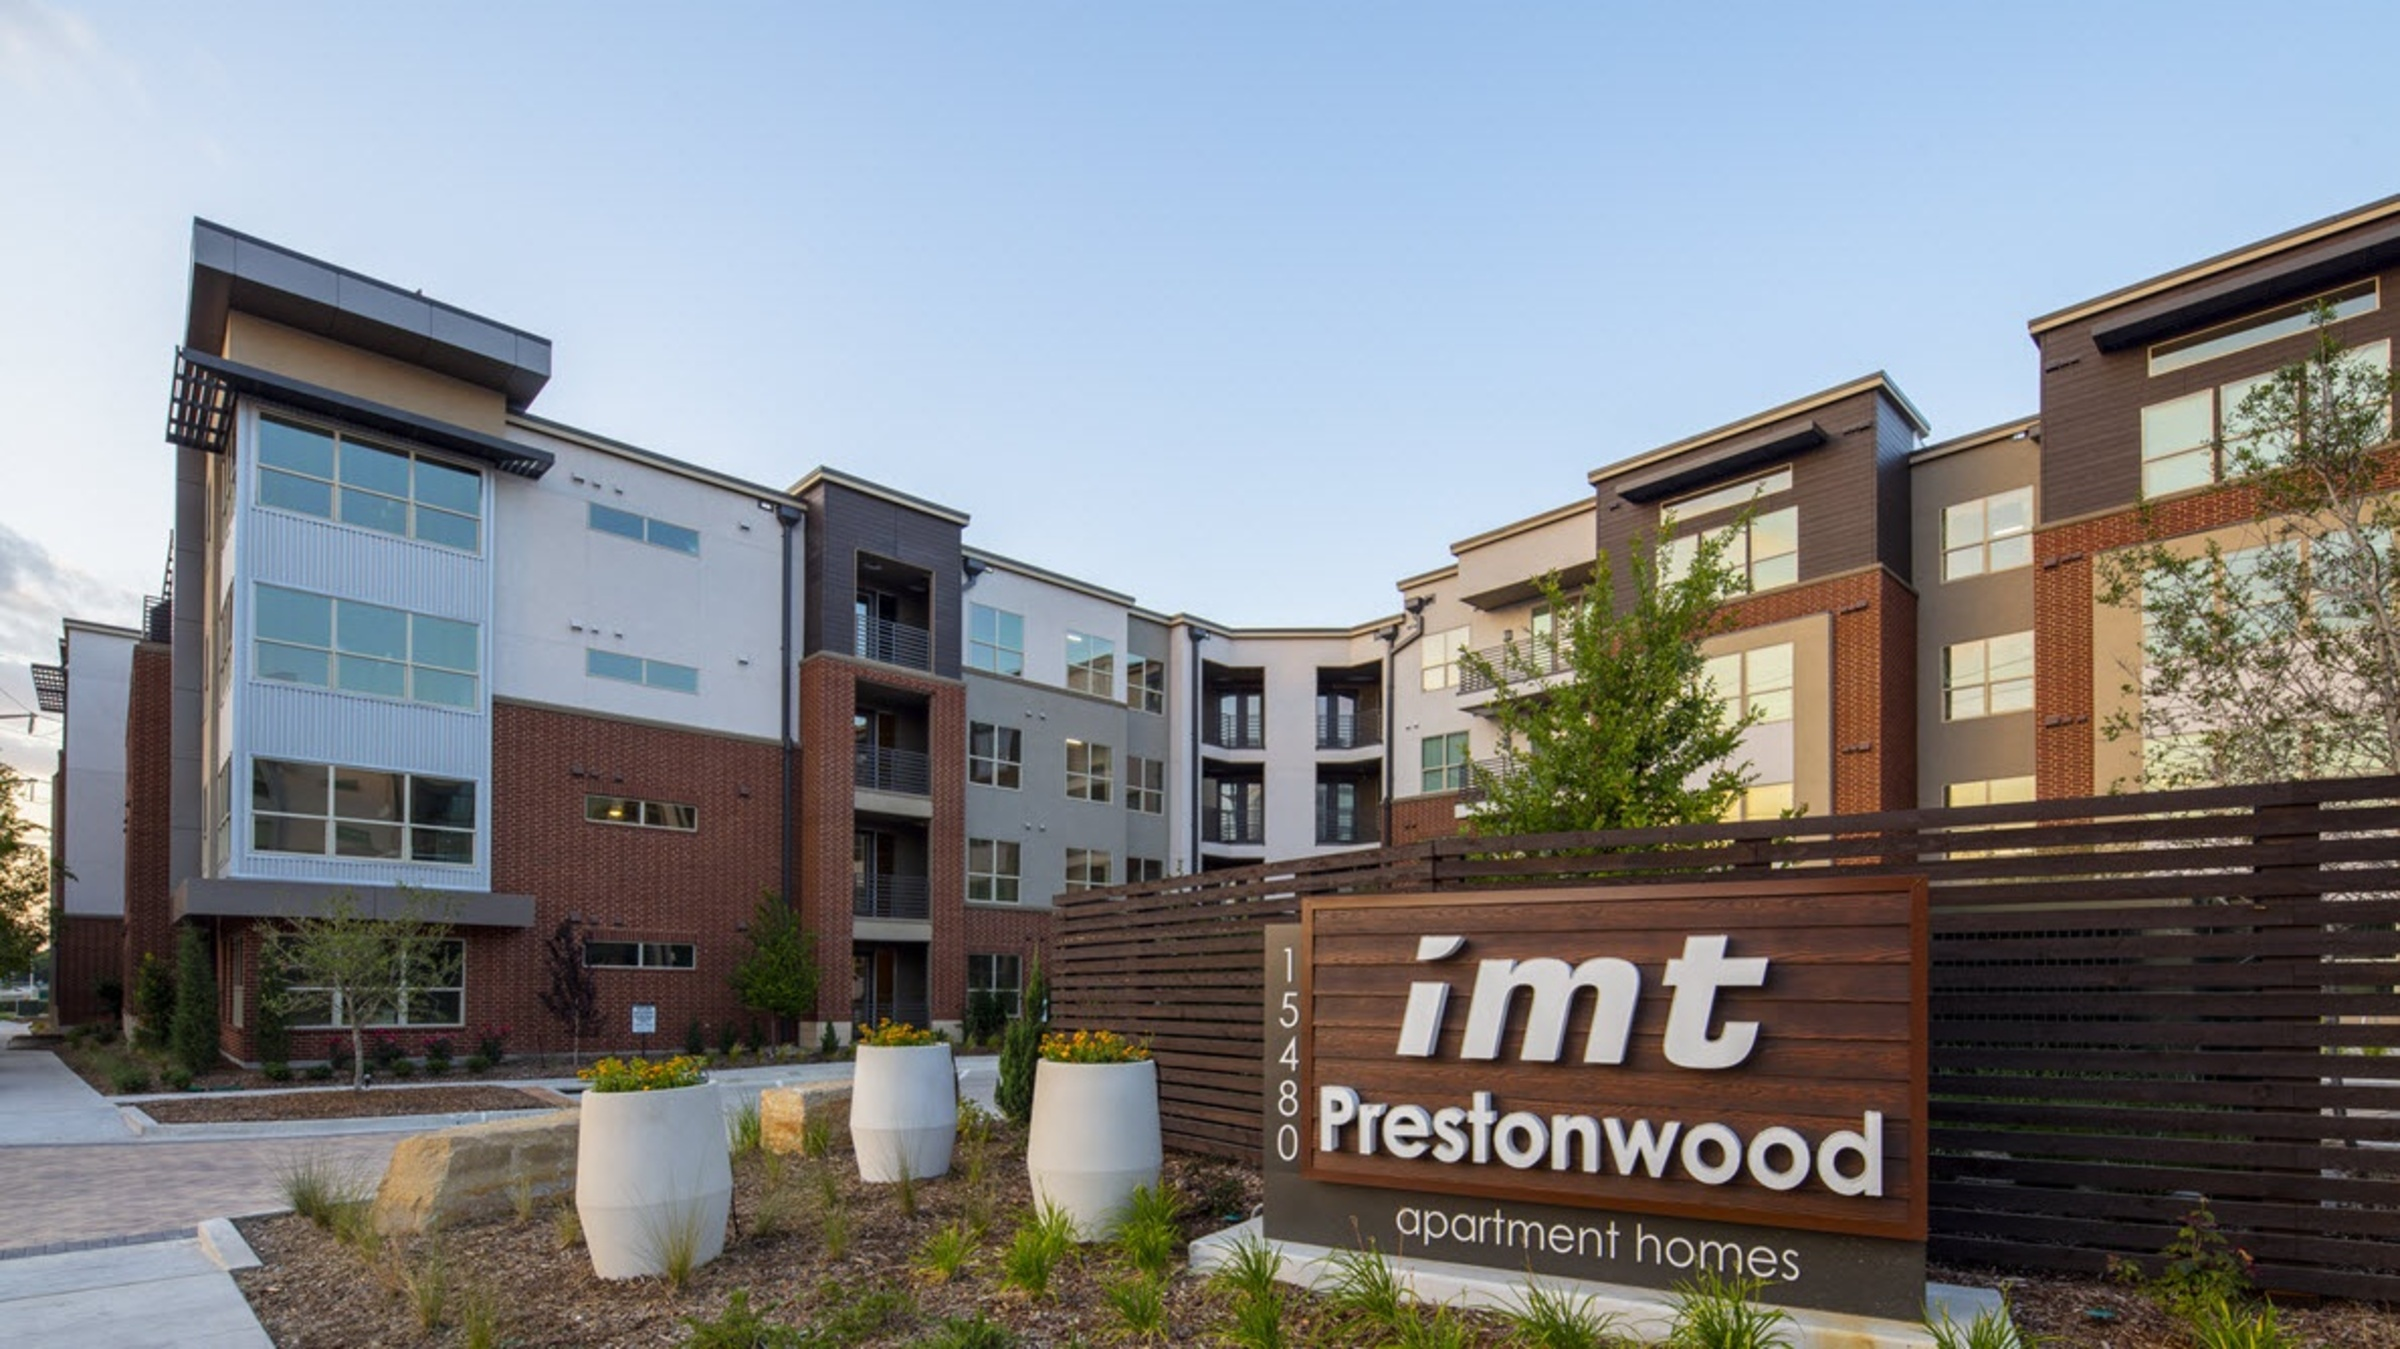 IMT Prestonwood